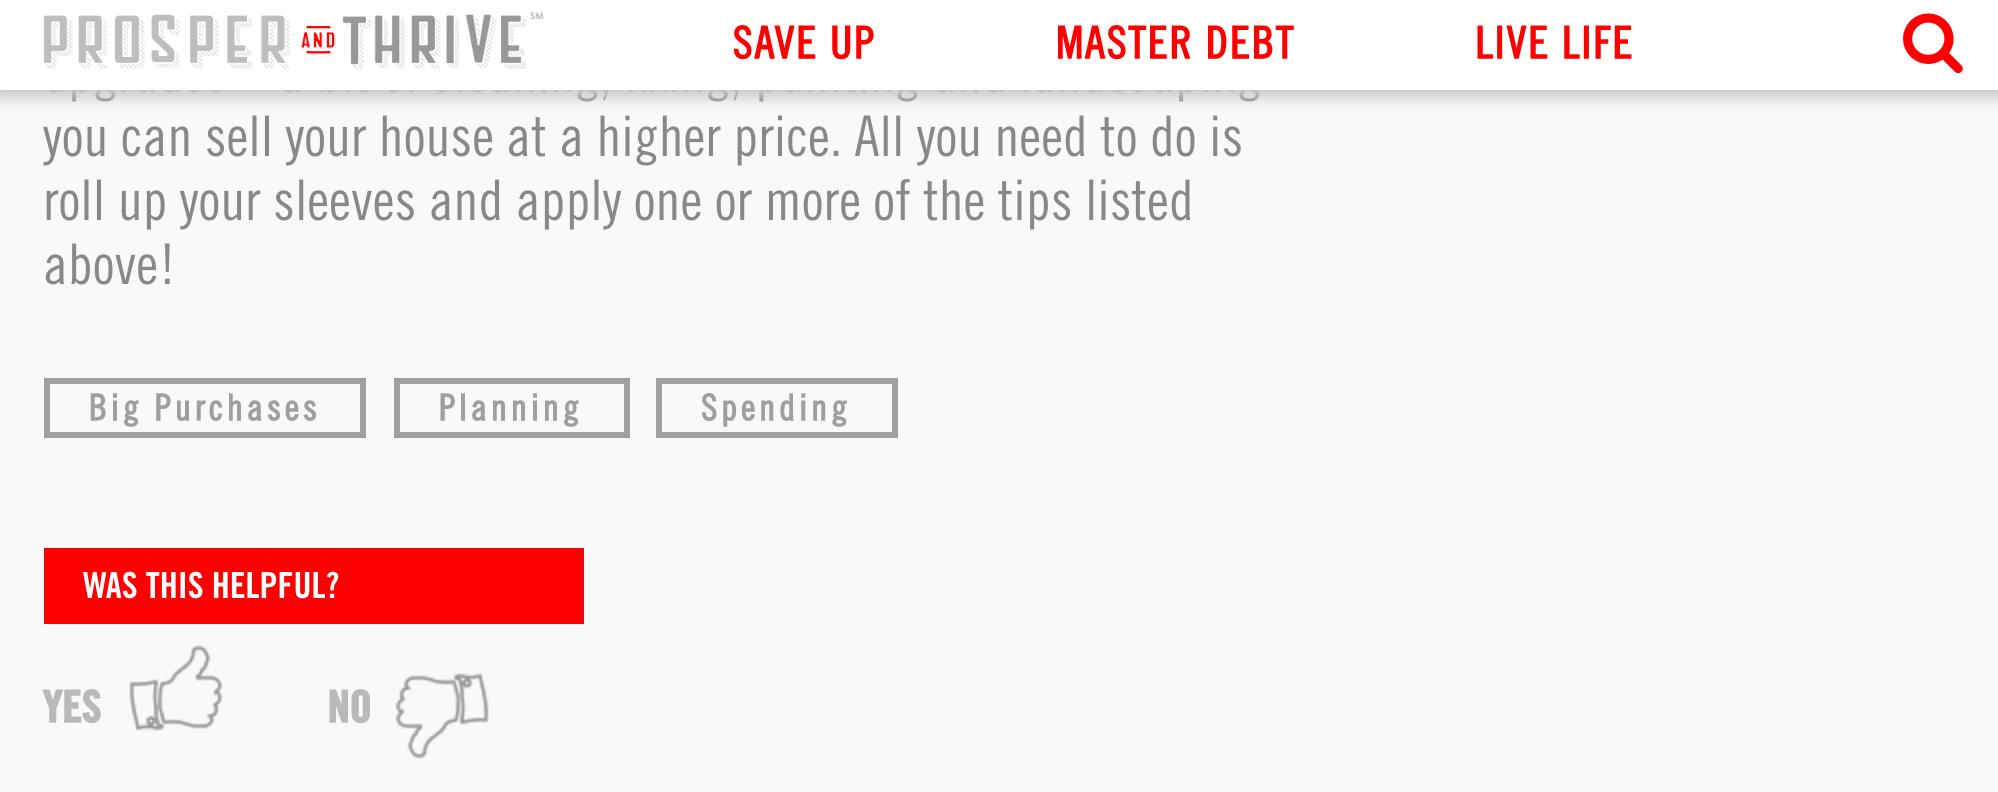 Santander_Prosper and Thrive.png